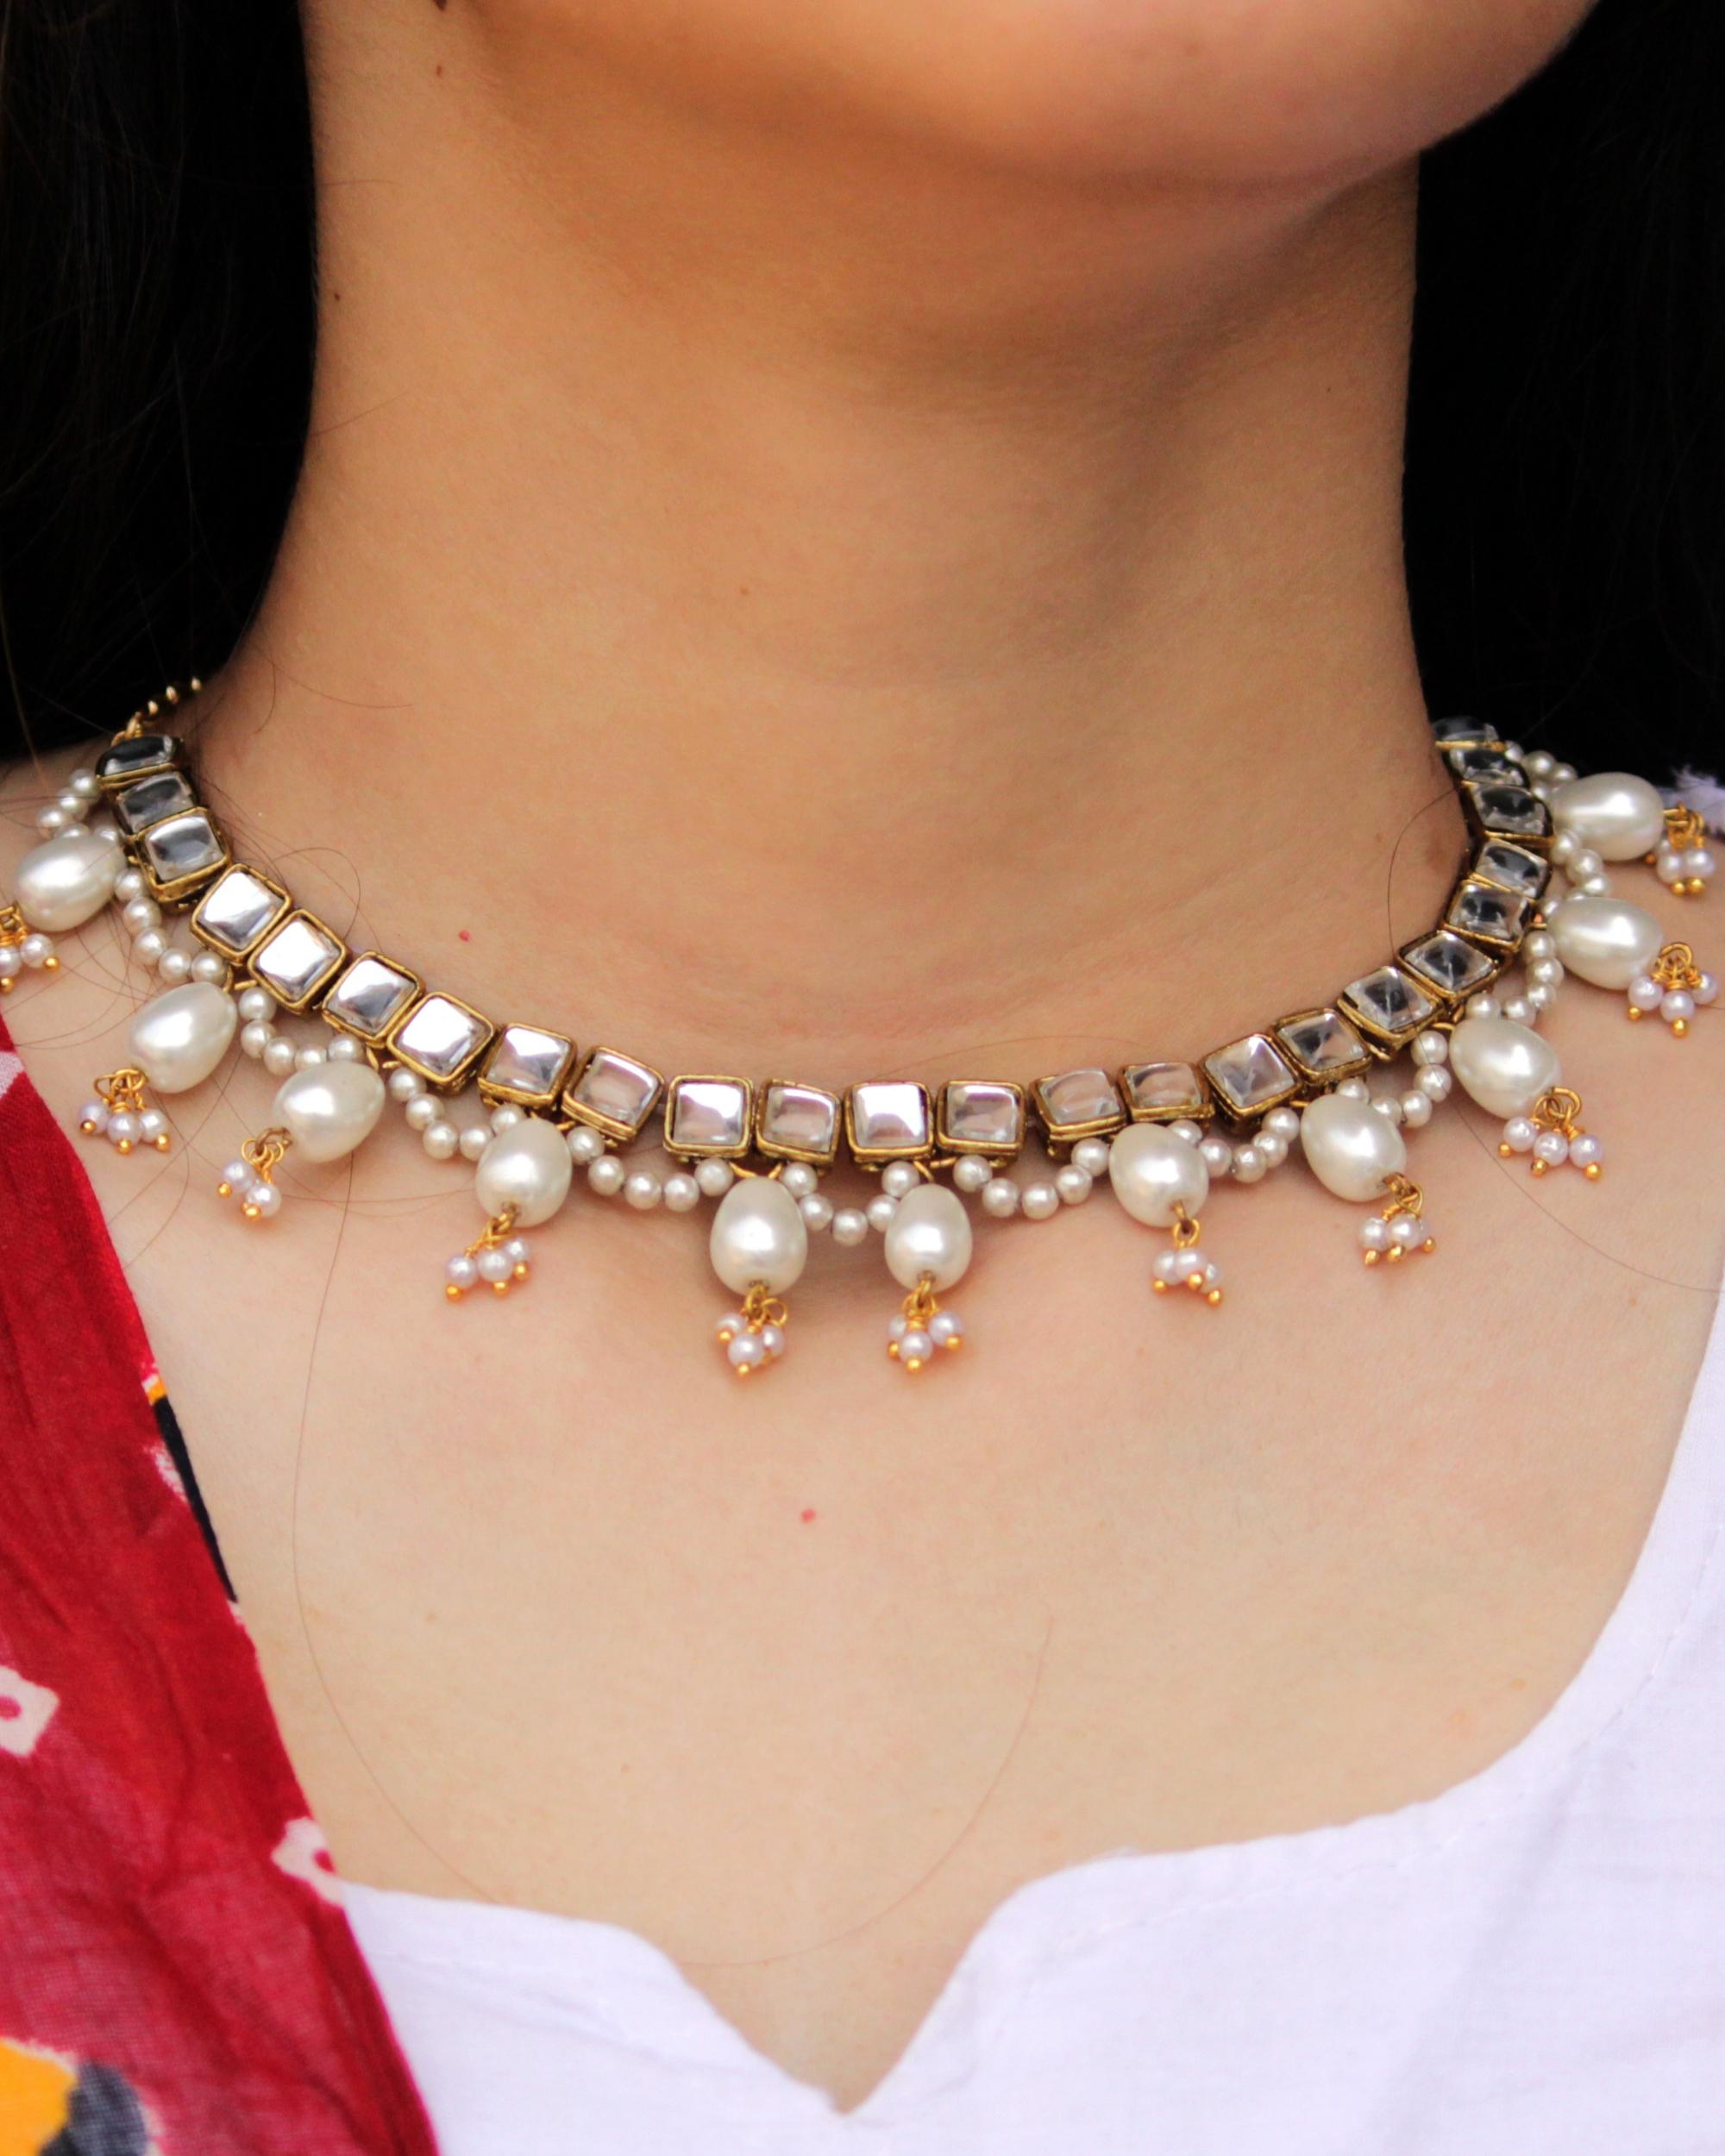 Square kundan oval drop pearl necklace